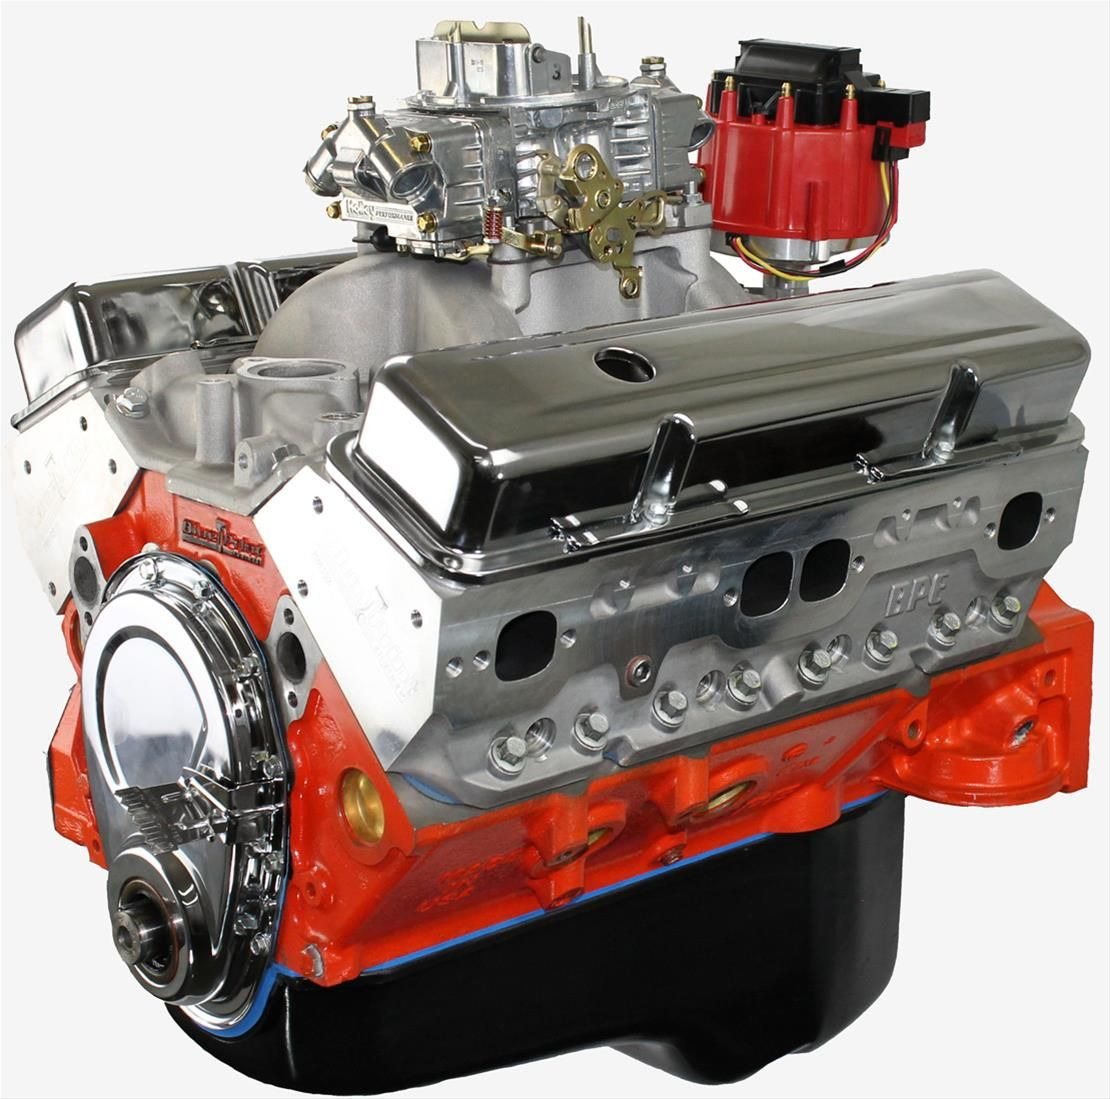 Find blueprint engines gm 400 cid 460hp dressed crate engines engine malvernweather Gallery